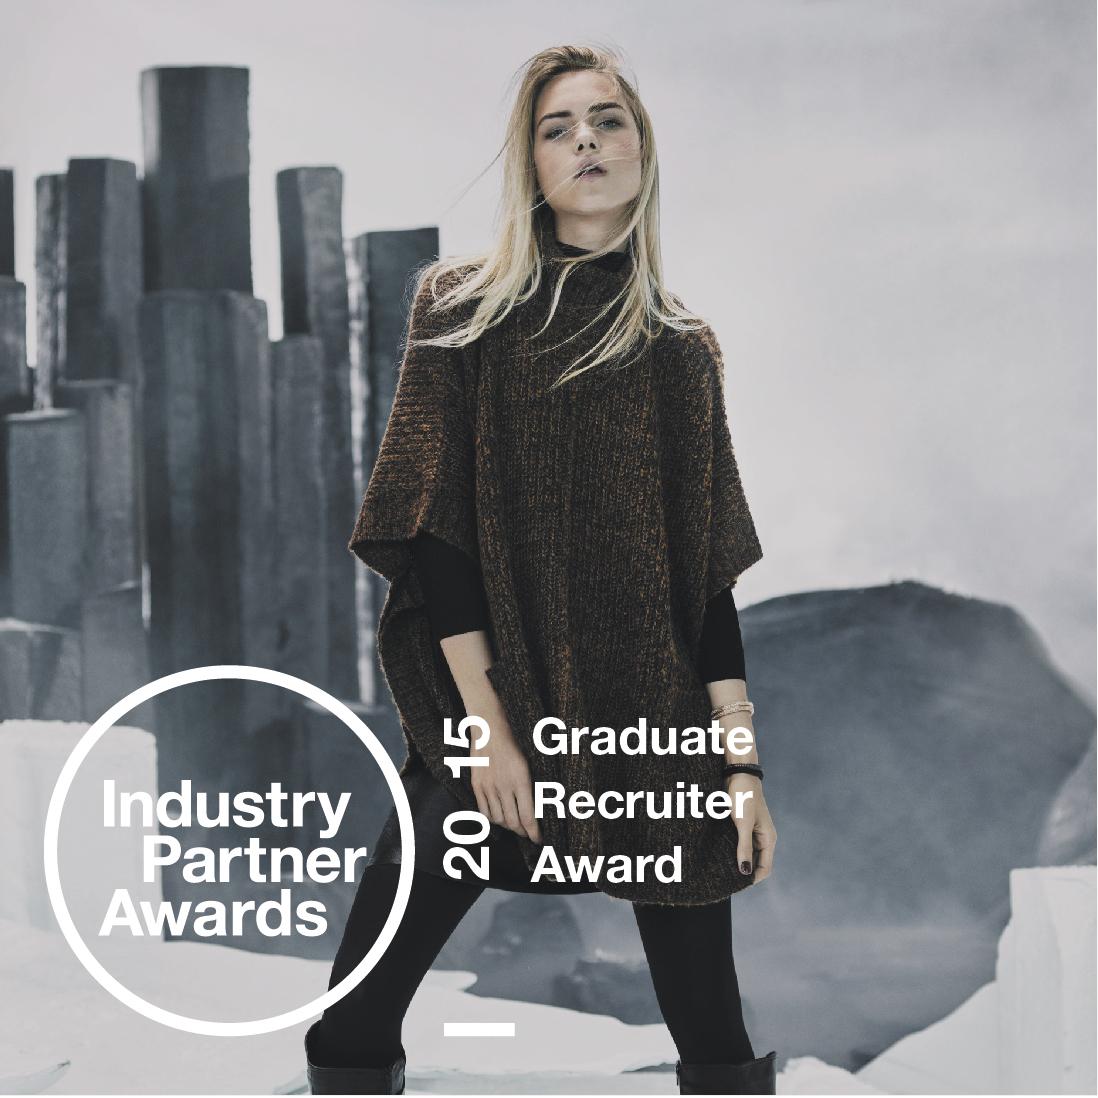 Graduate Recruiter Award